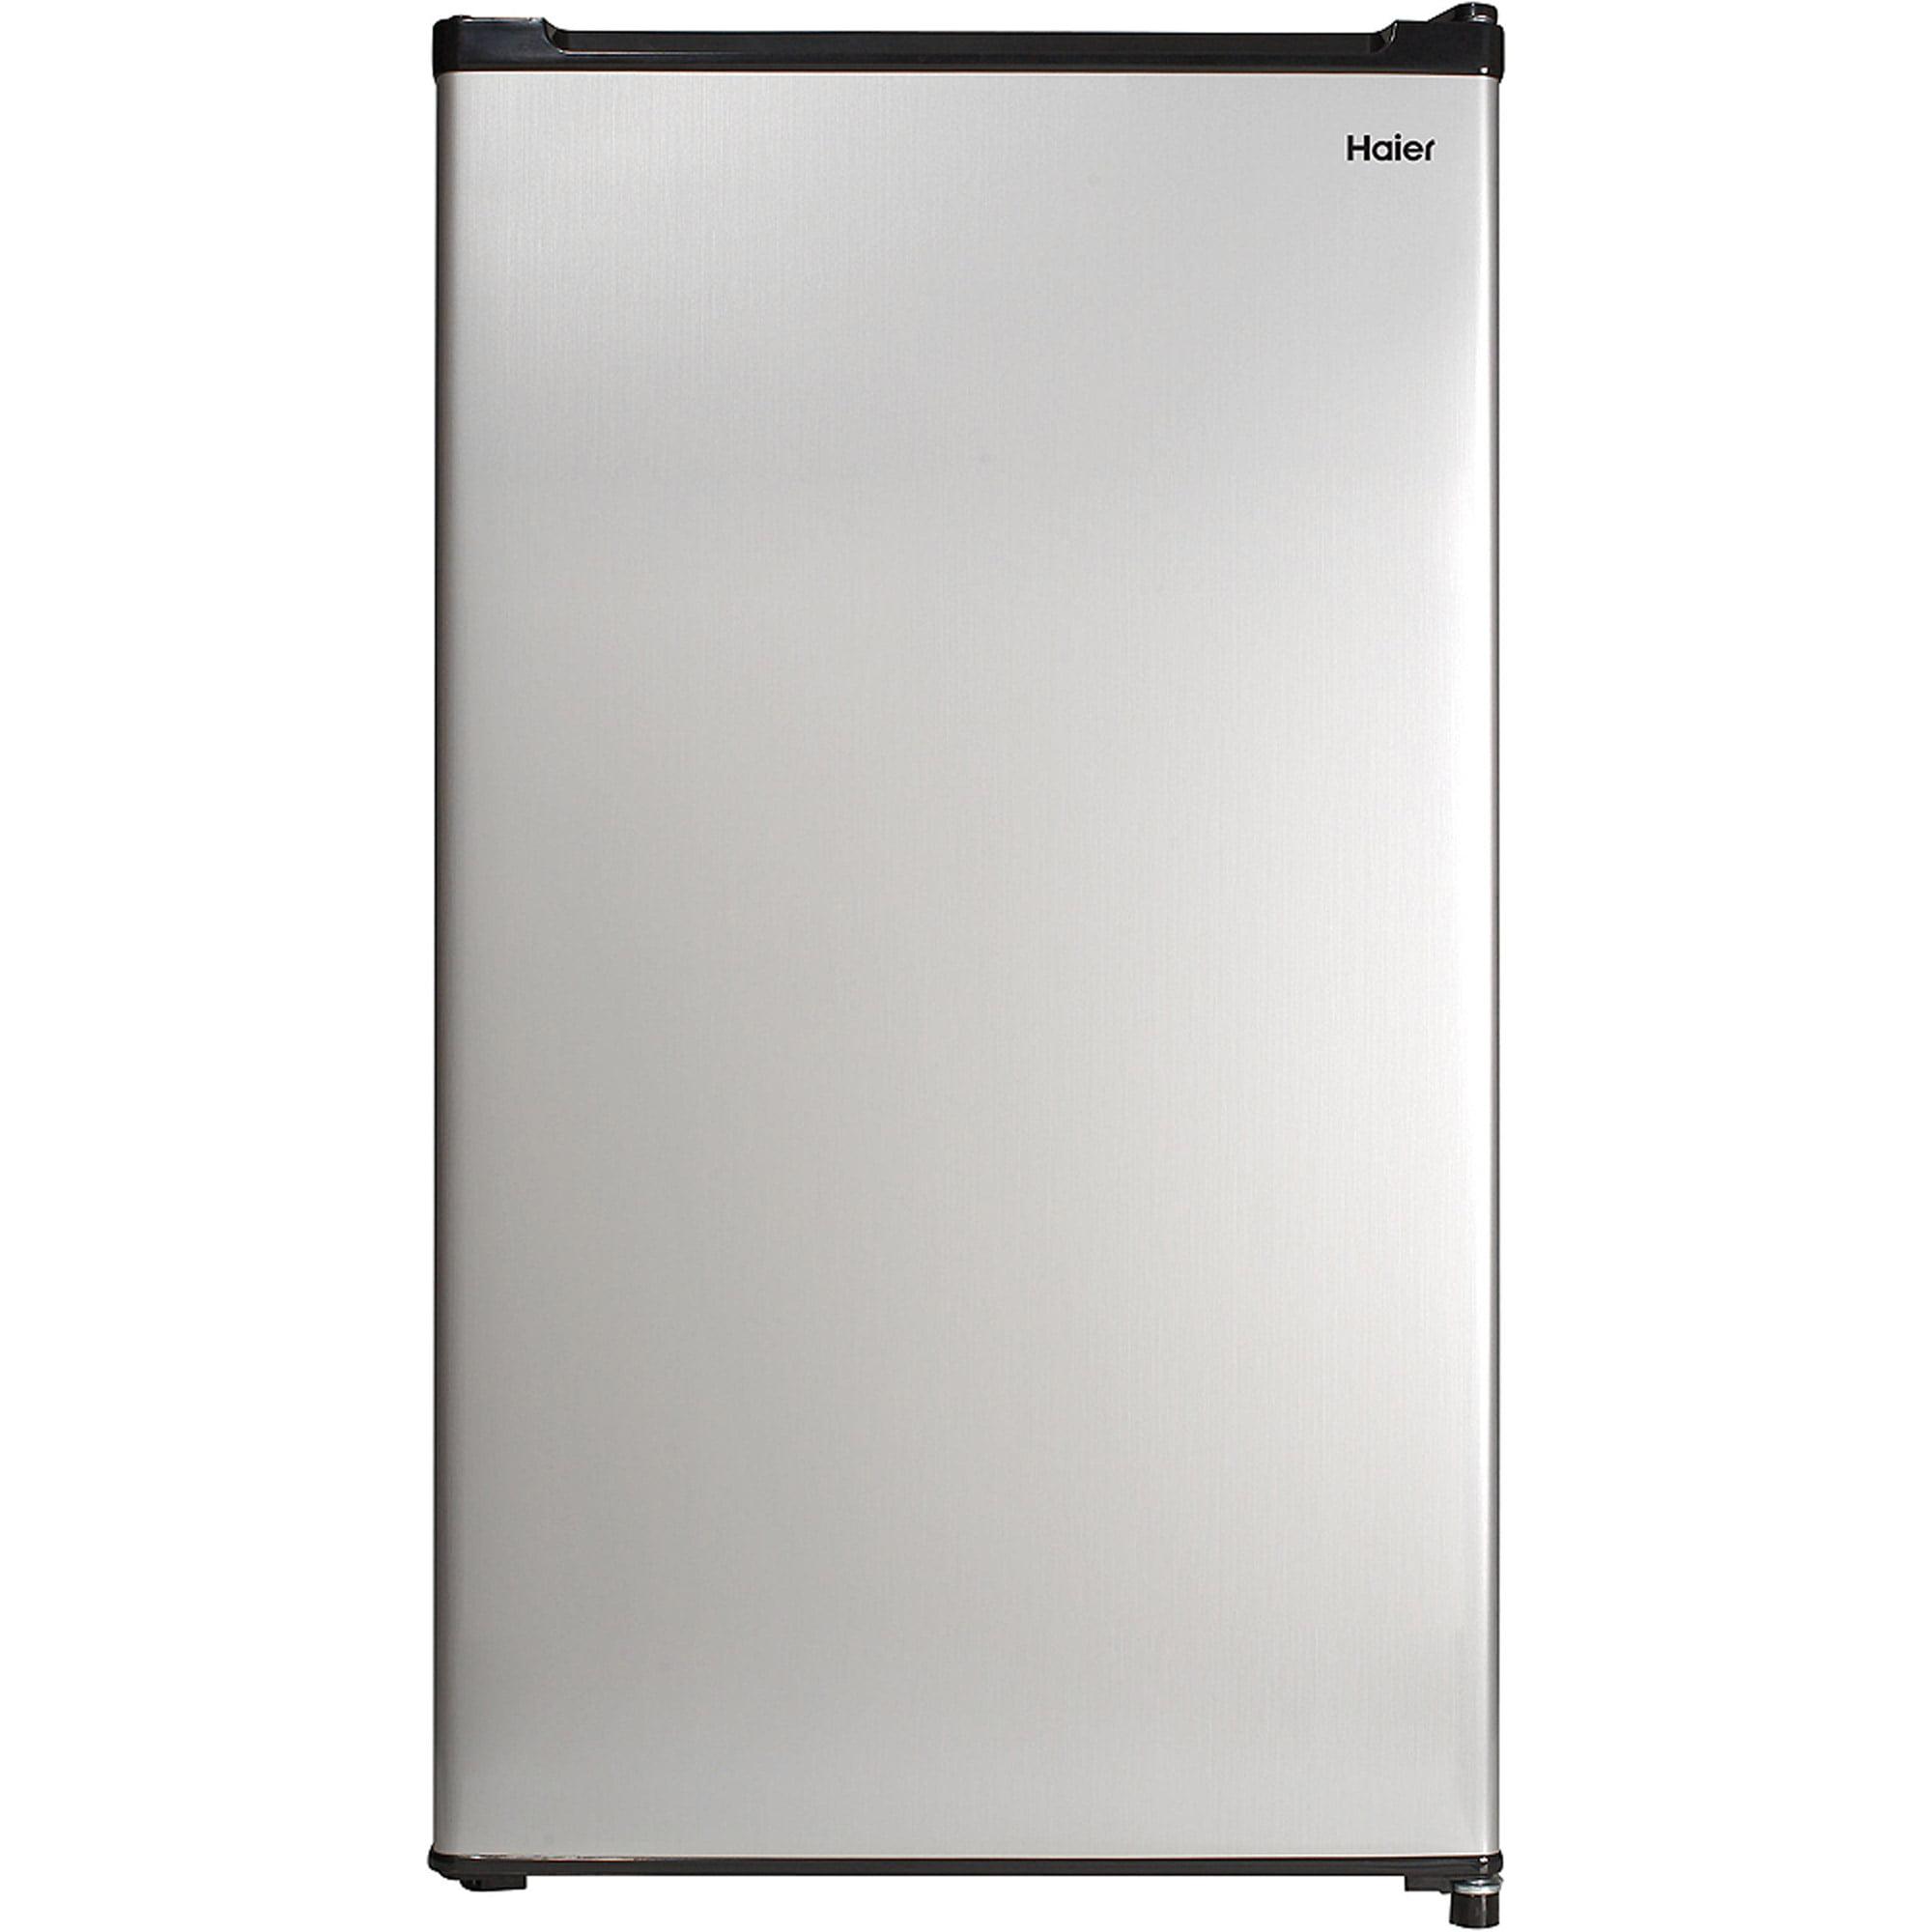 Haier 2.7 Cu Ft Single Door Compact Refrigerator HC27SW20RV, Virtual Steel